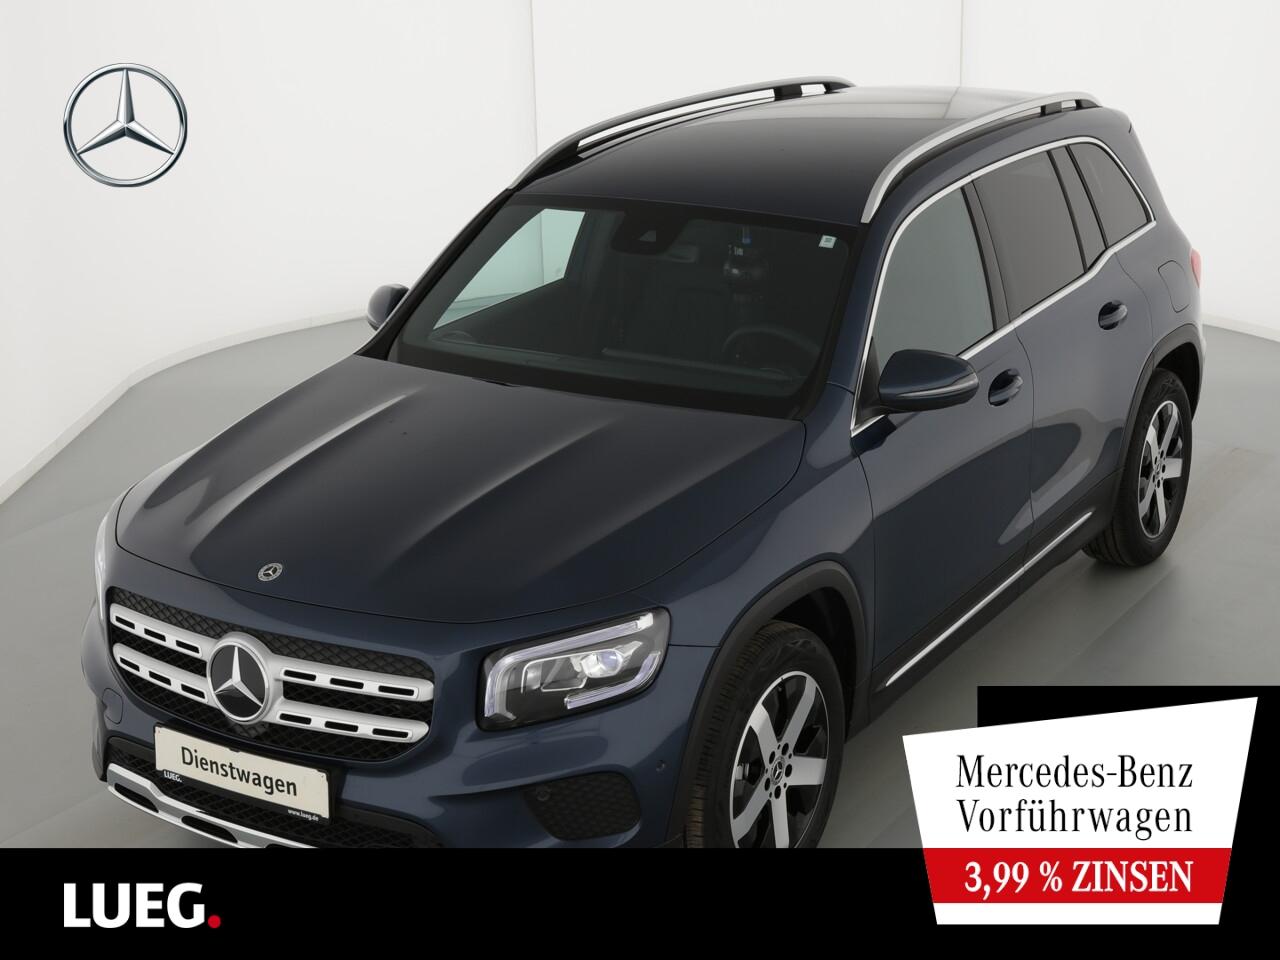 Mercedes-Benz GLB 180 PROGRESSIVE+AHK+KAMERA+LED+MBUX-ADVANCED, Jahr 2021, Benzin